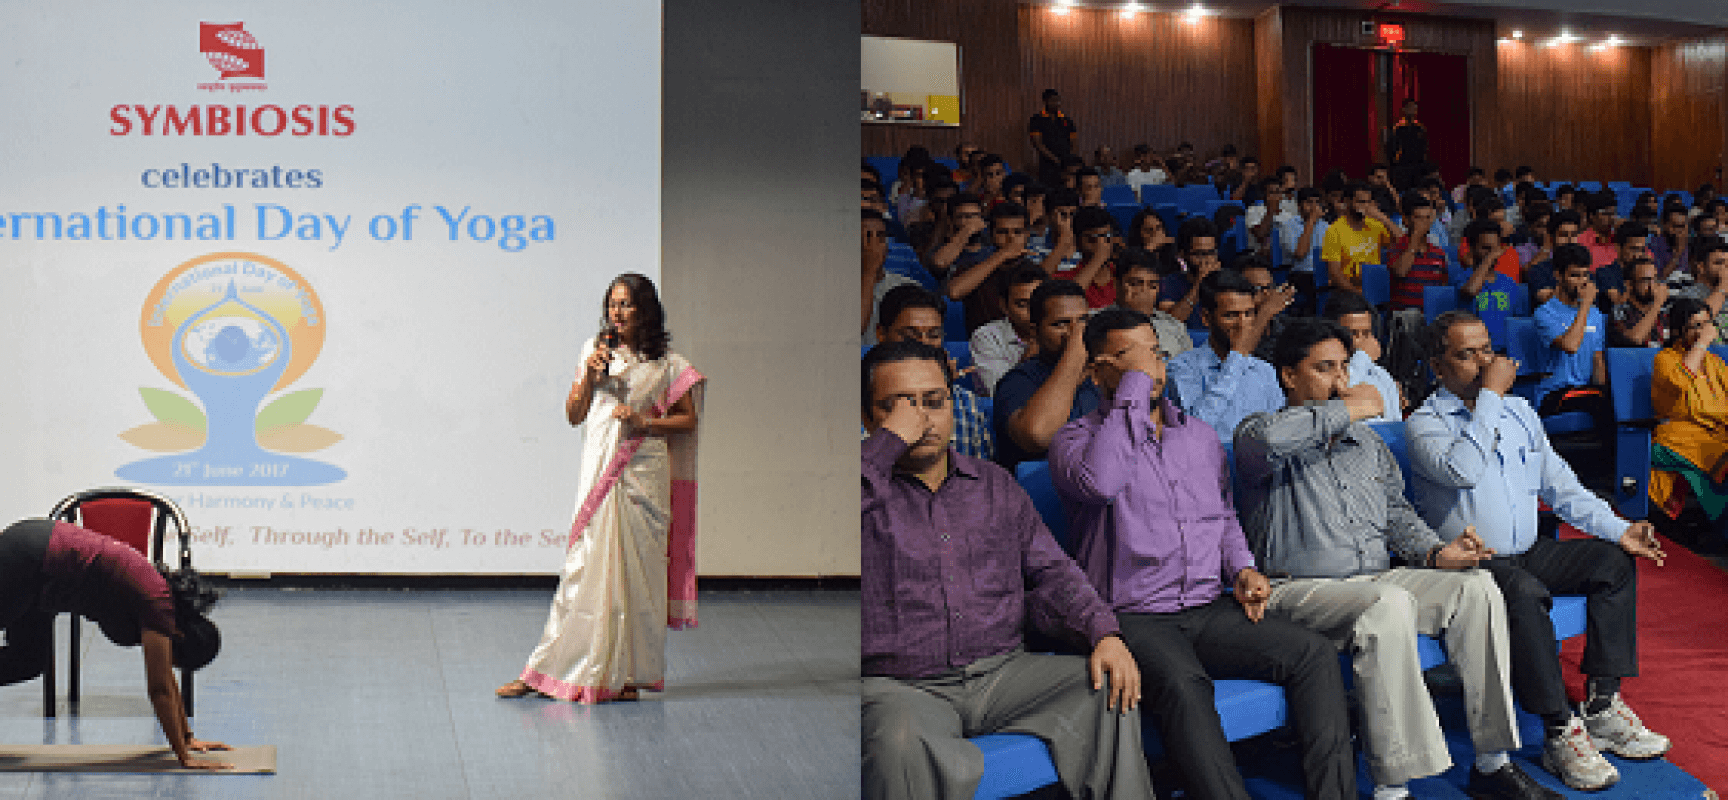 International Yoga Day Celebration at Symbiosis